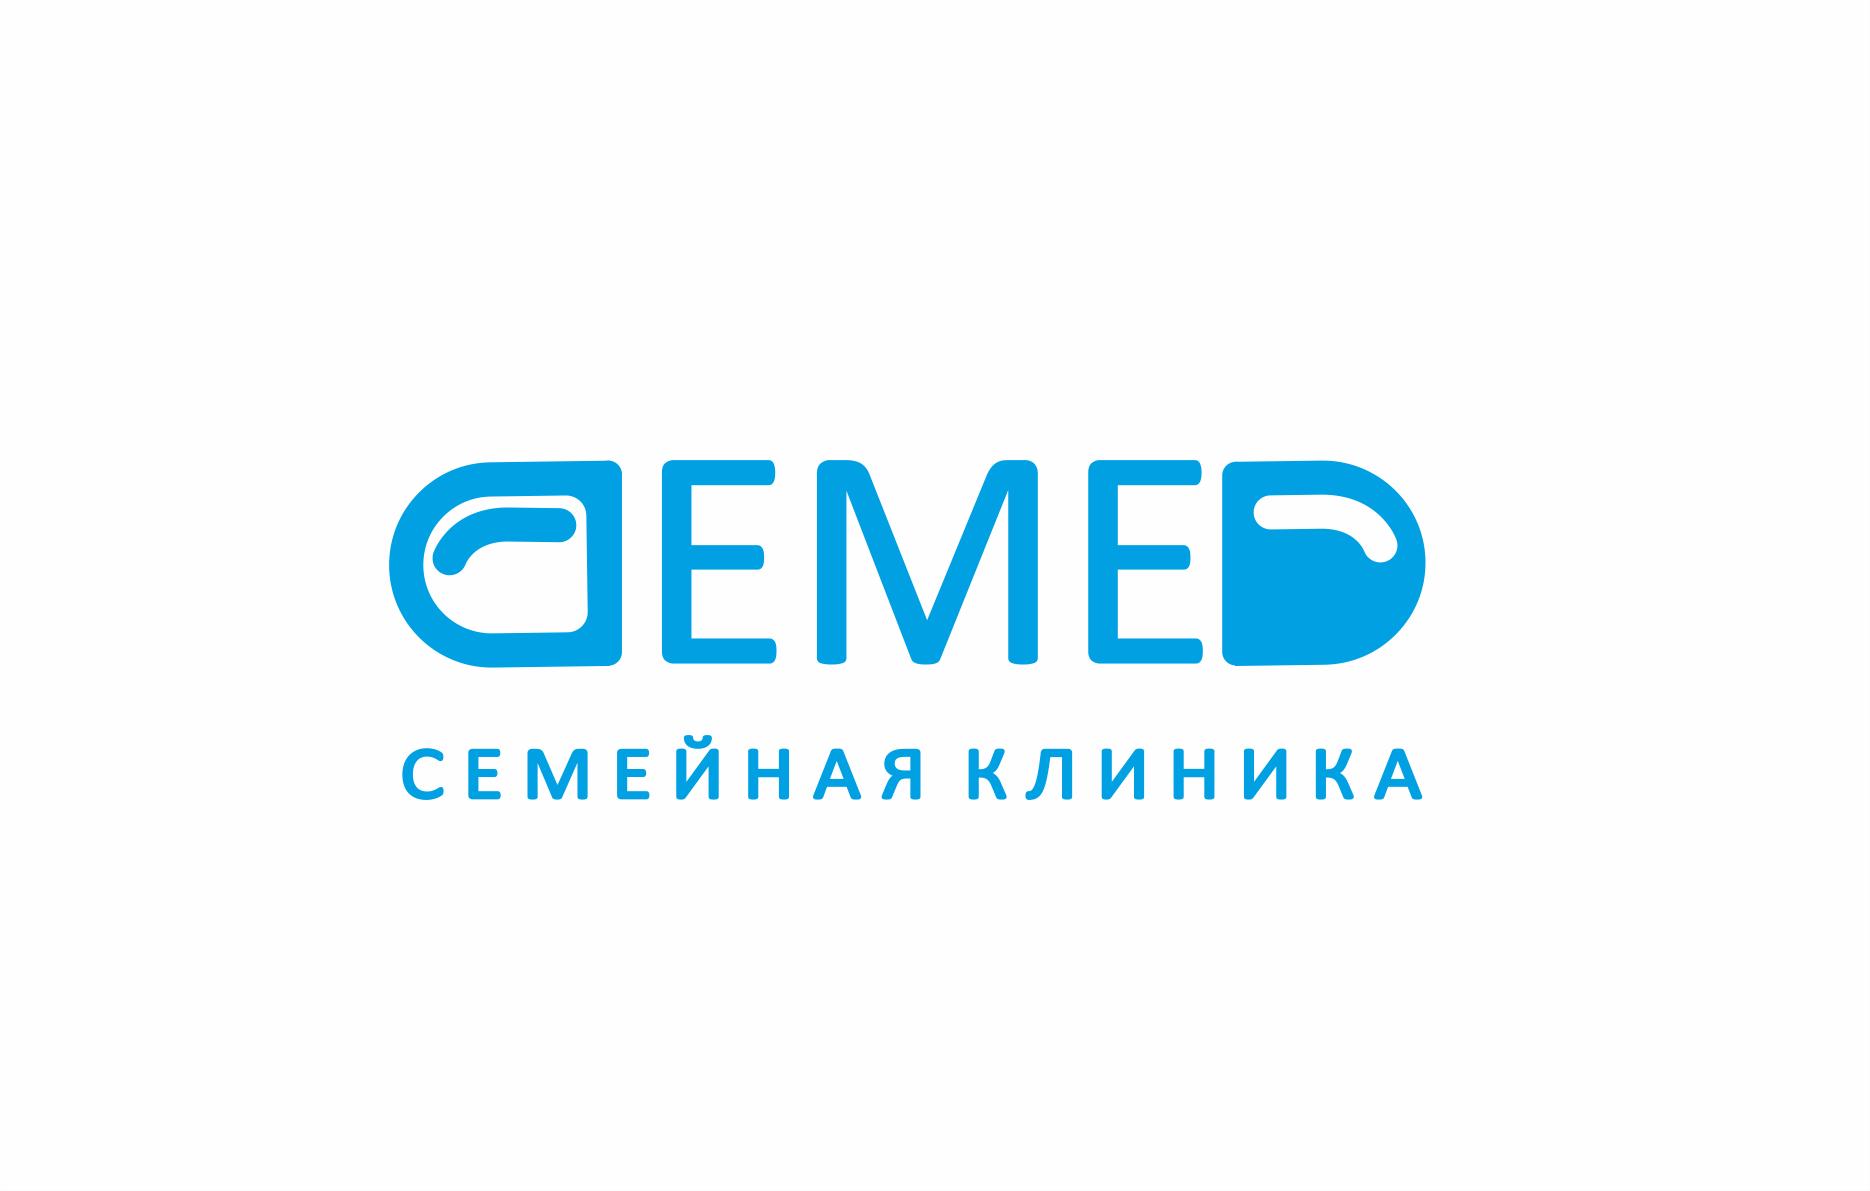 Логотип медицинского центра фото f_6515dc84b6bd722b.png